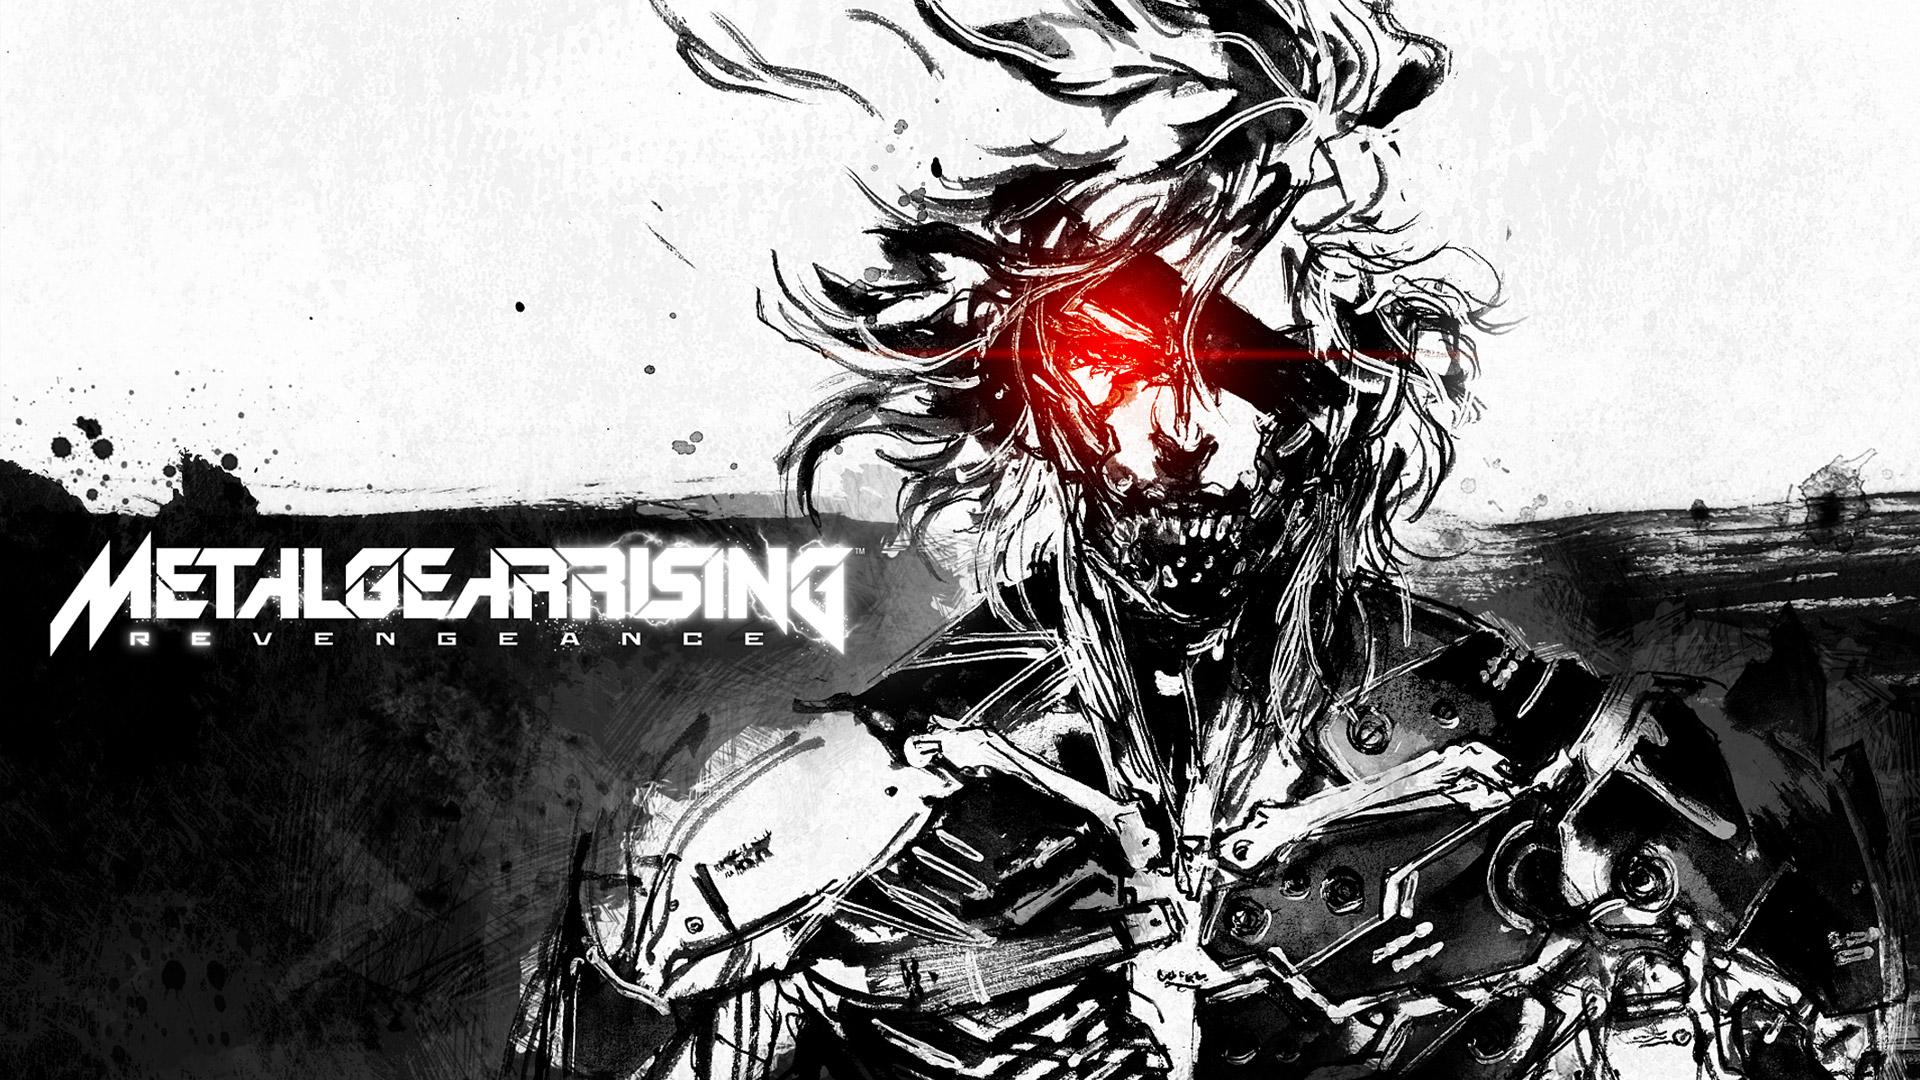 Metal Gear Rising: Revengeance (Japanese: メタルギア ライジング リベンジェンス Hepburn: Metaru Gia Raijingu: Ribenjensu?) is an action hack and slash video ...